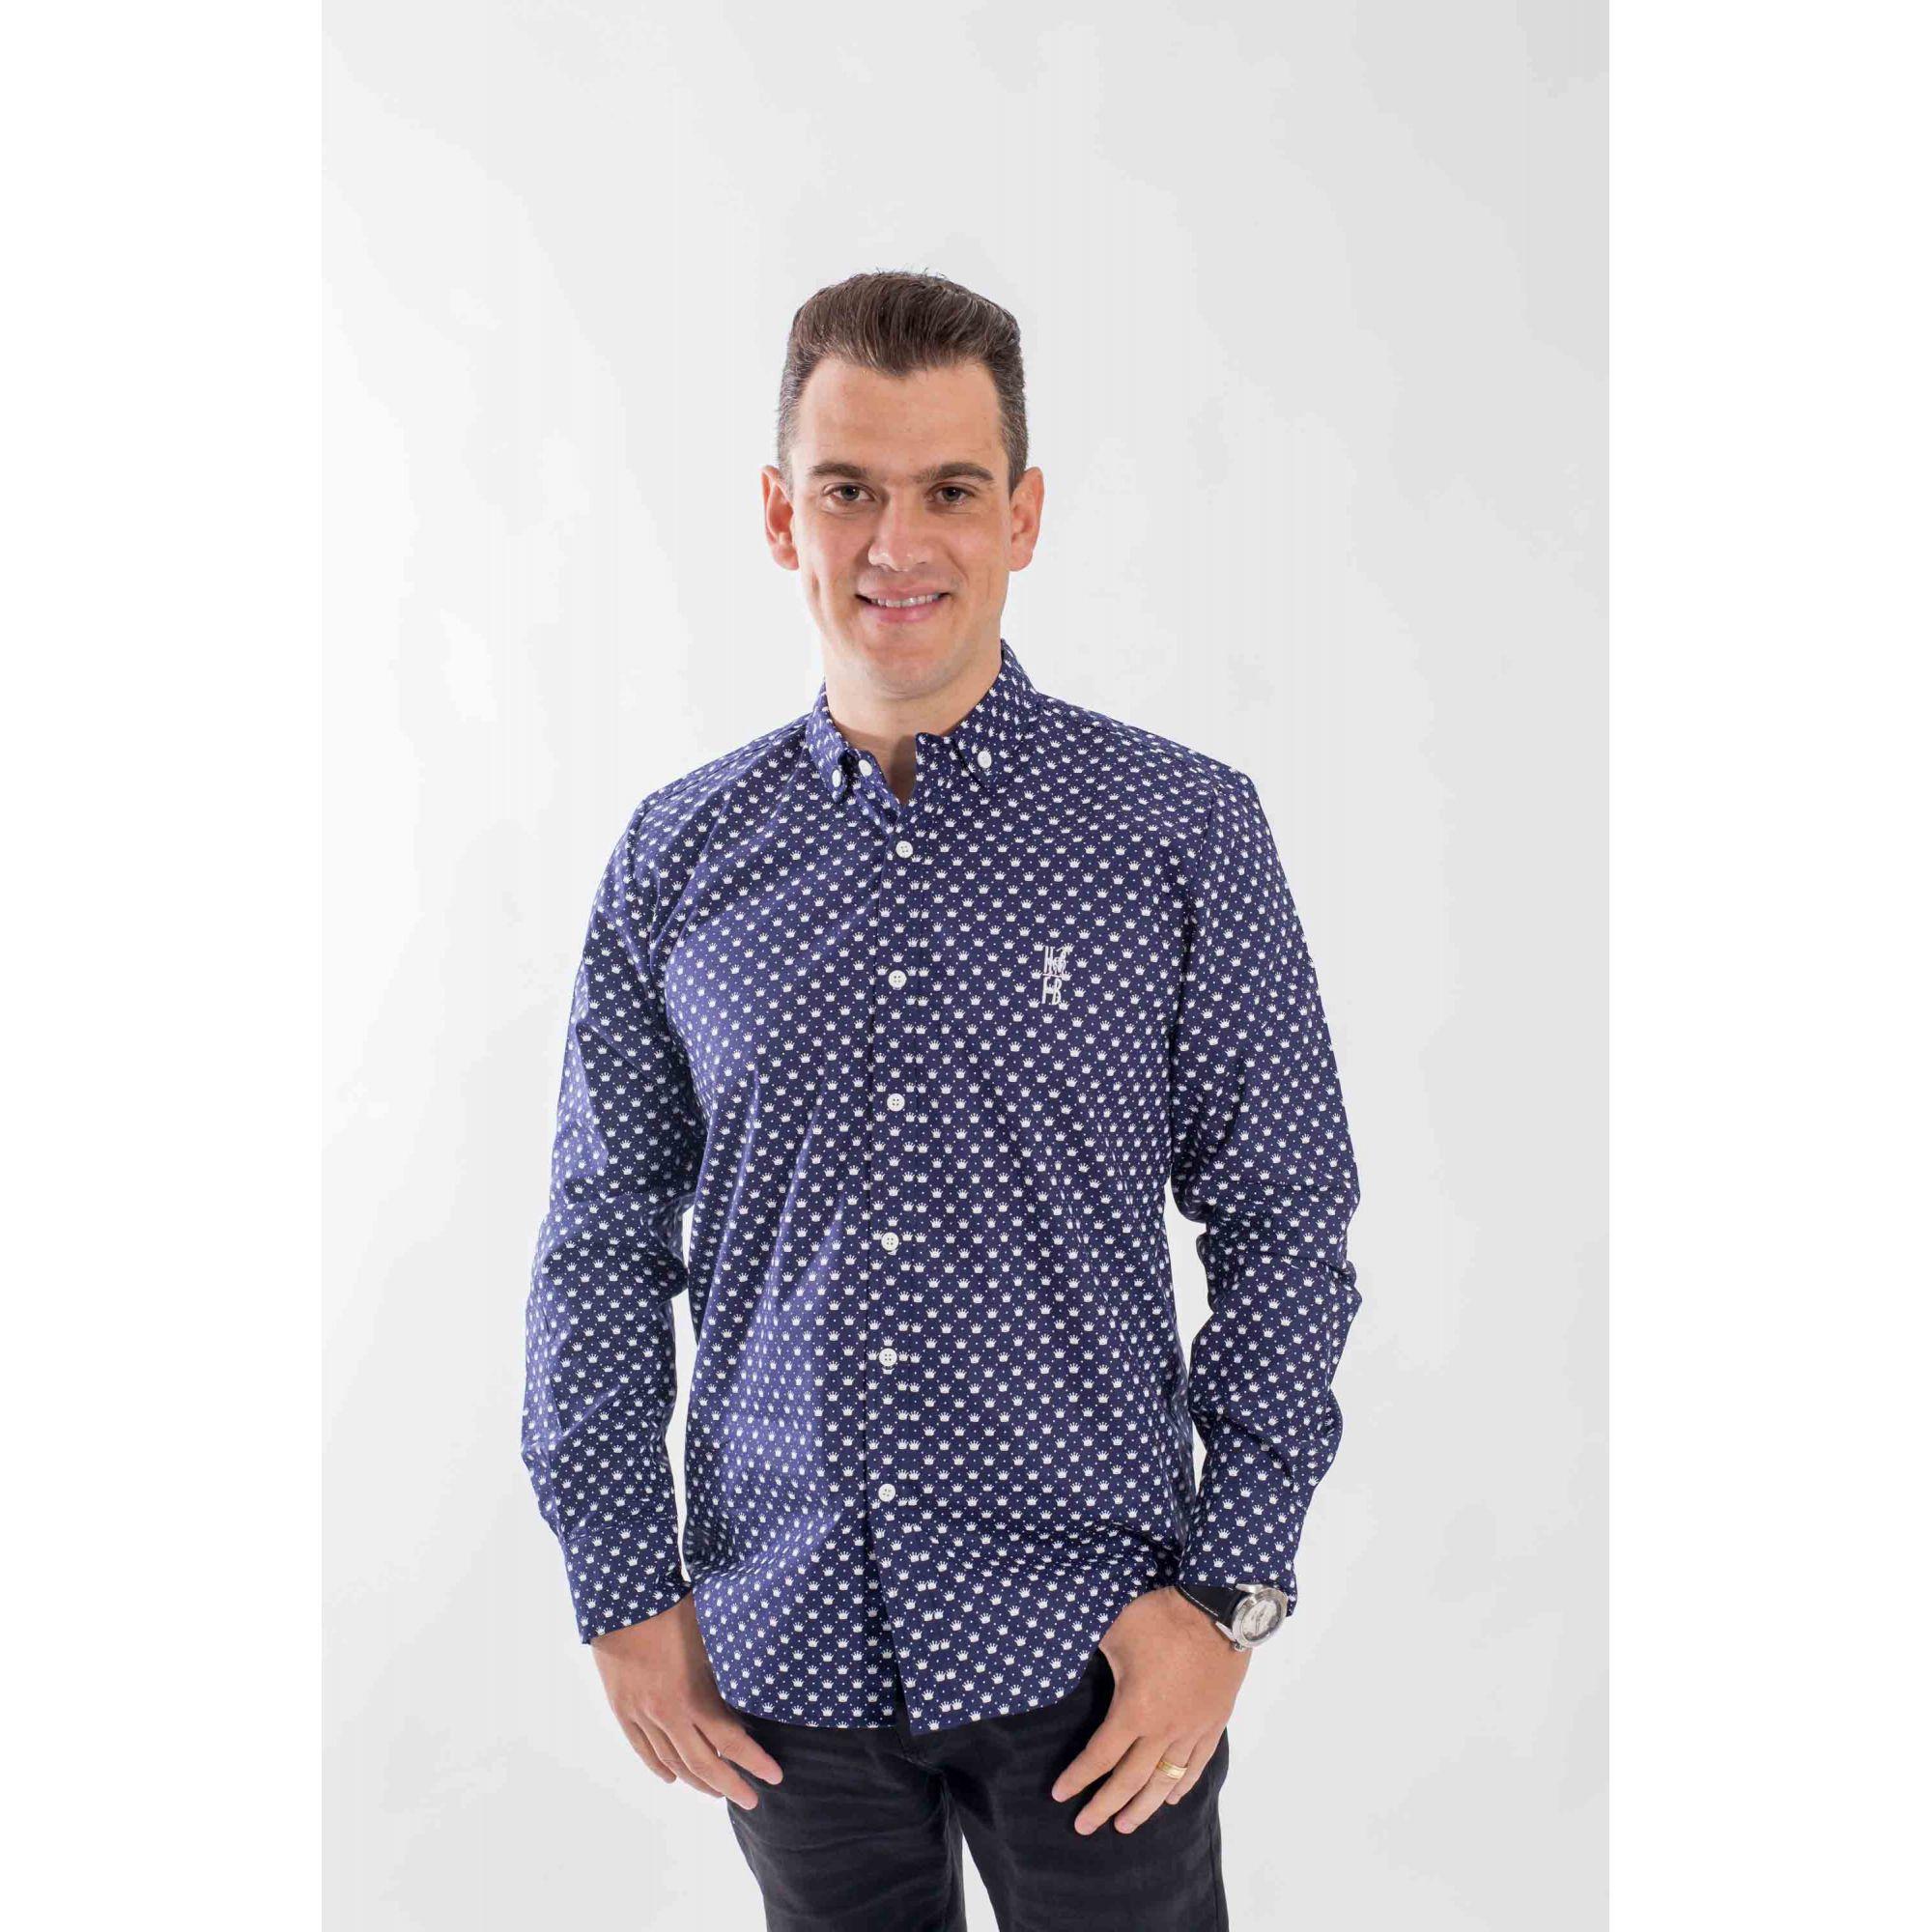 Camisa Social Principe Azul  - Heitor Fashion Brazil